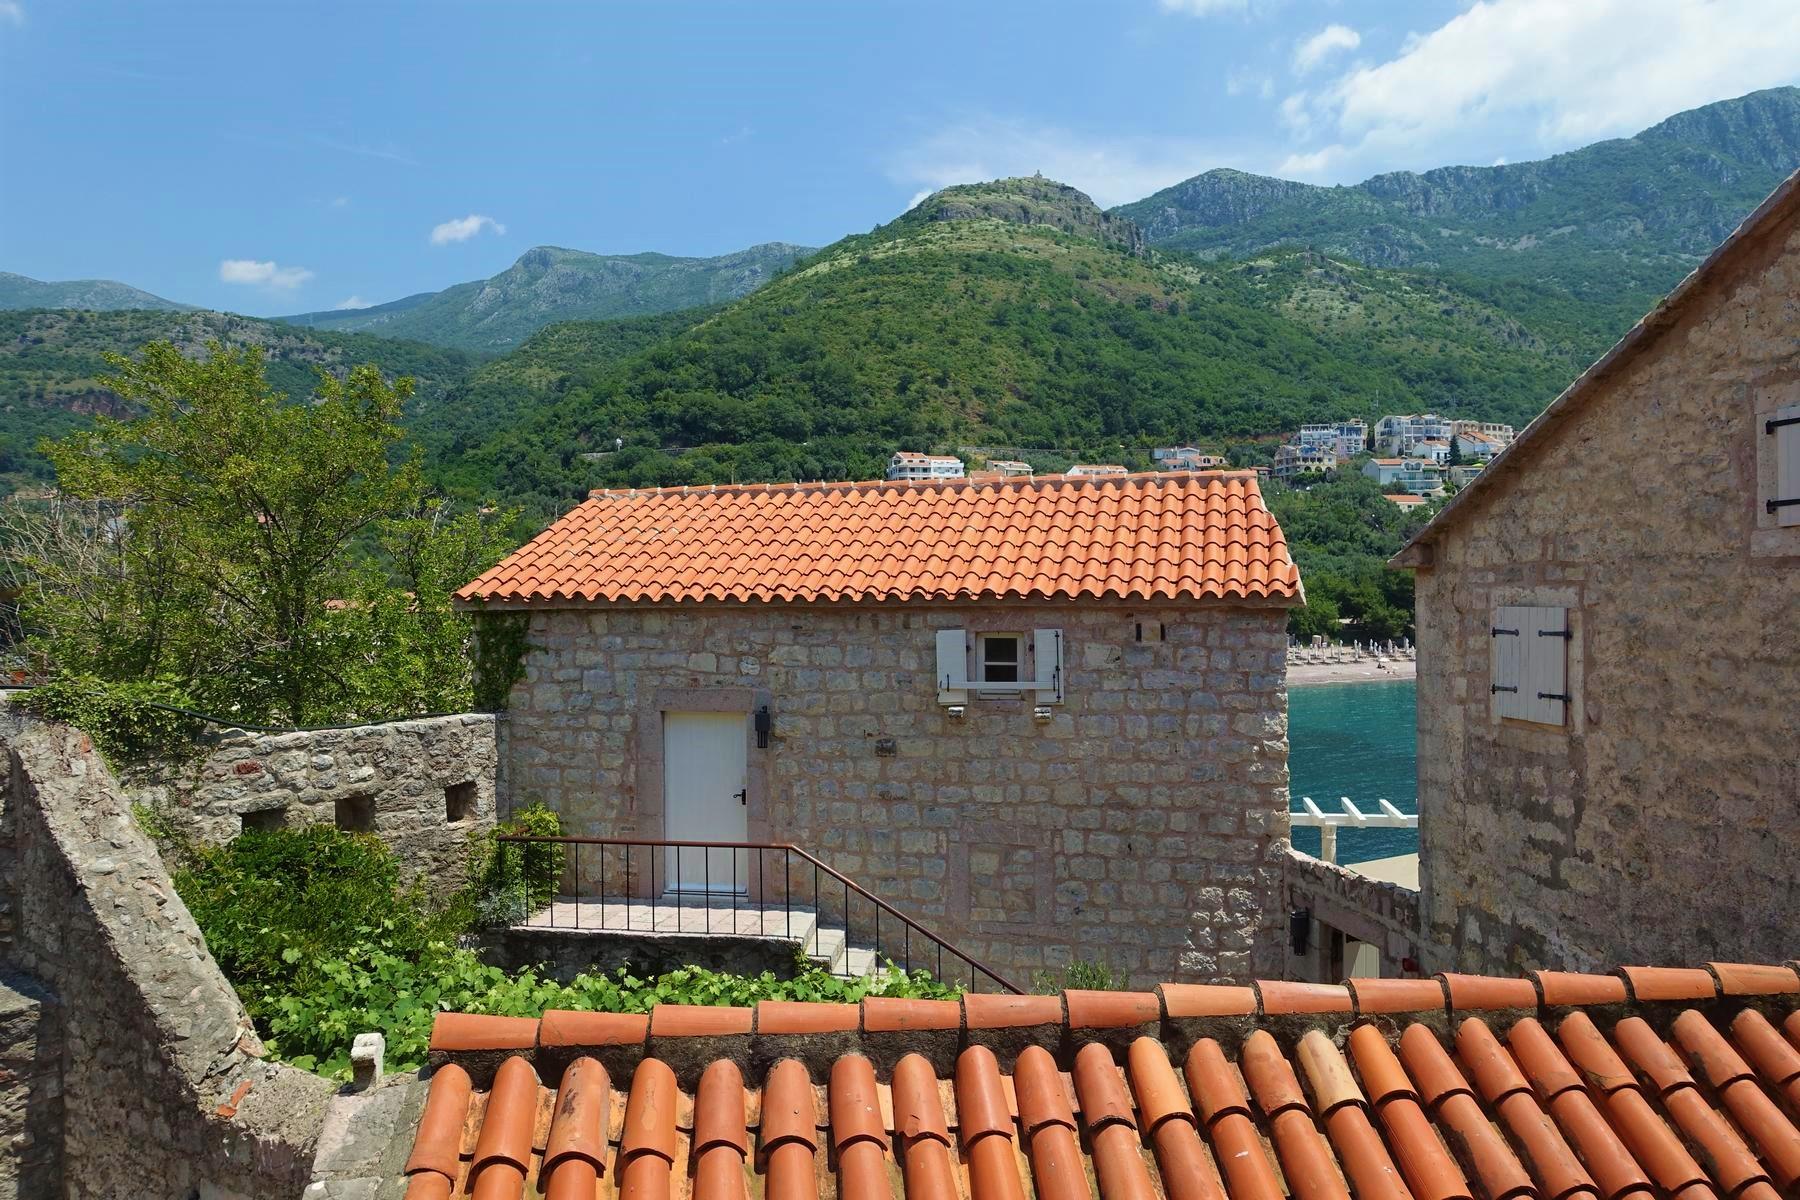 Sveti Stefan - the old stone houses